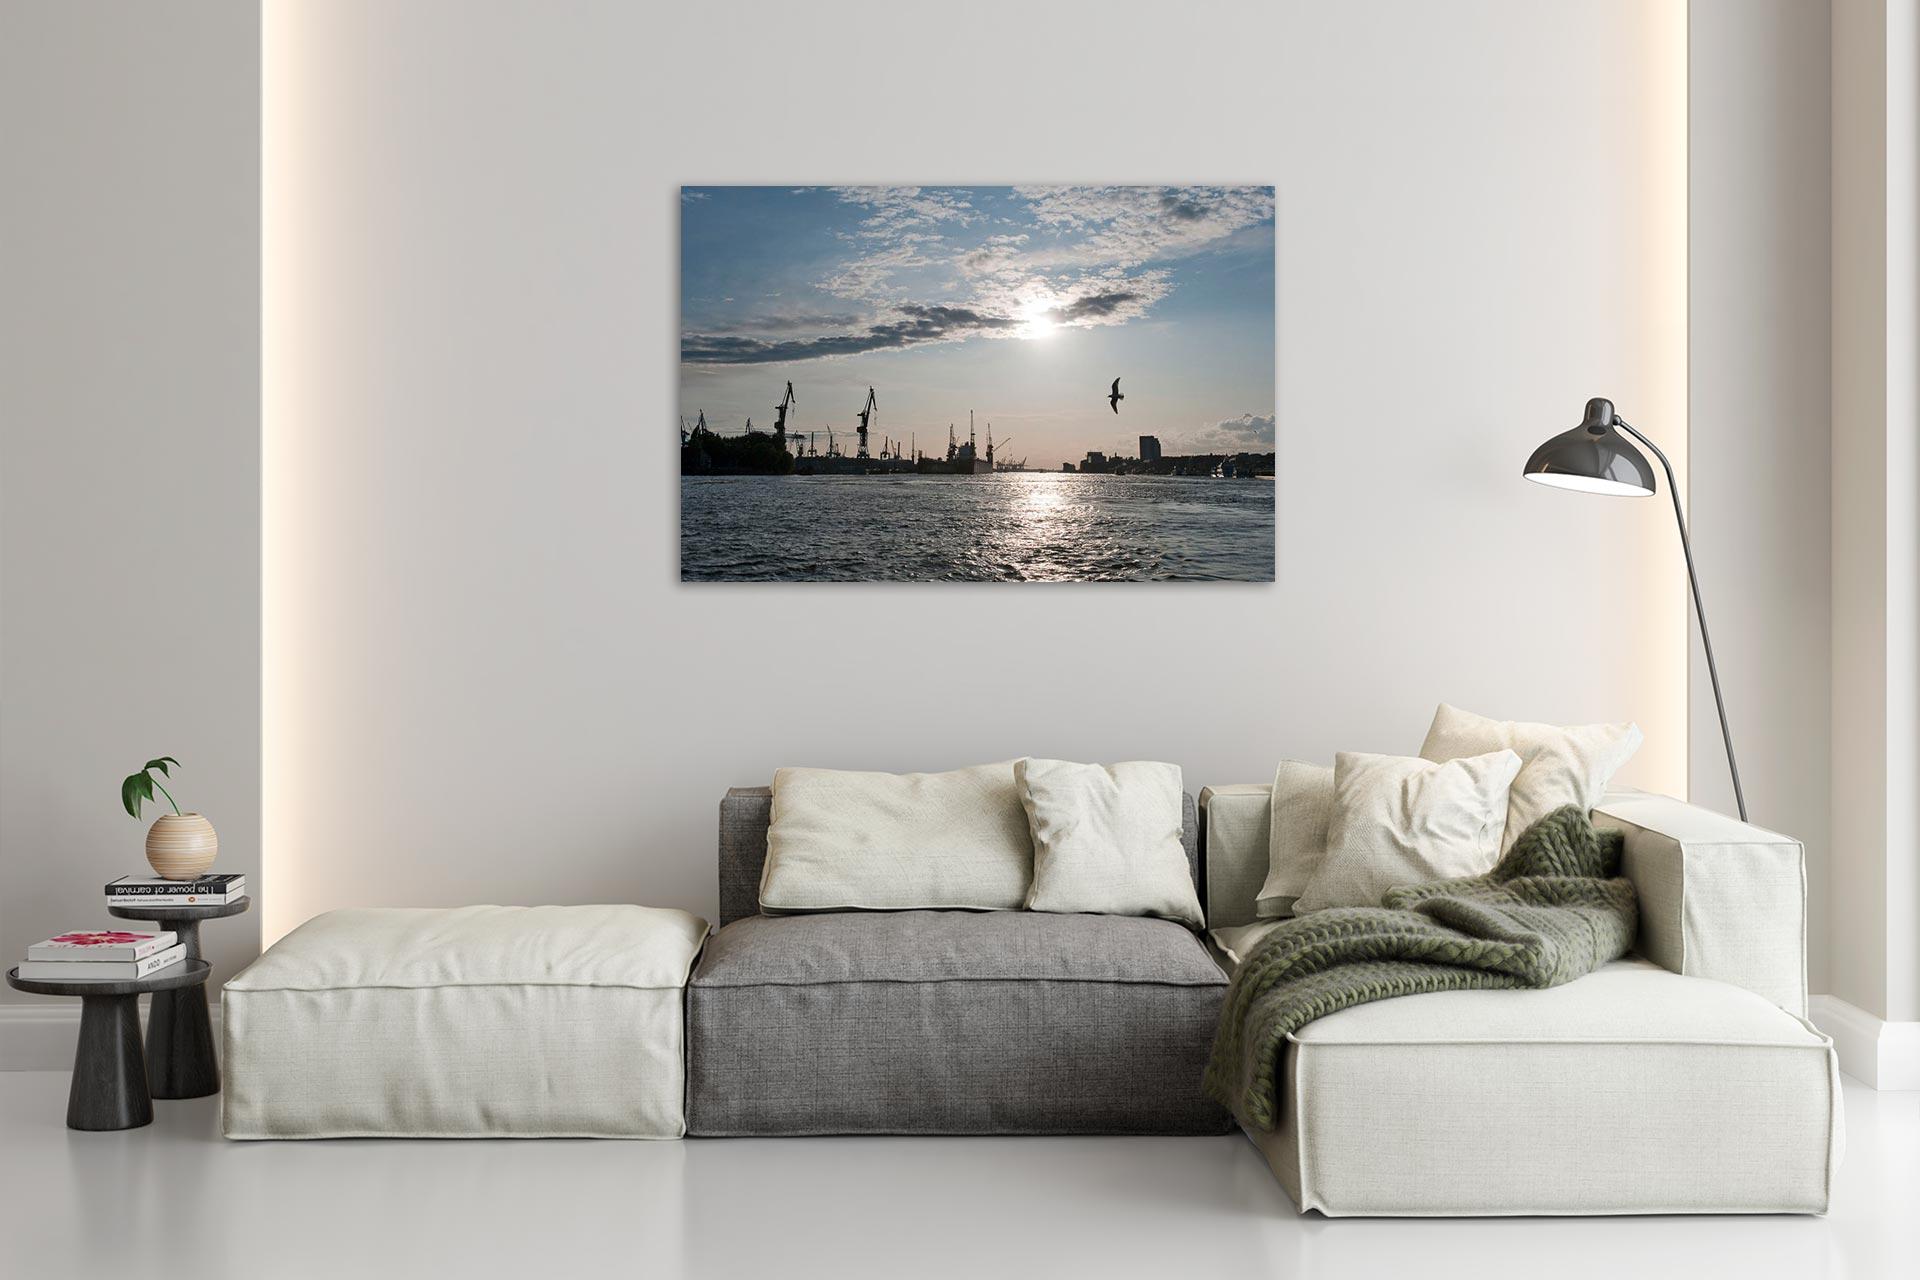 NL003-unten-am-fluss-landungsbruecken-hamburg-wandbild-auf-leinwand-acrylglas-aludibond-wohnzimmer